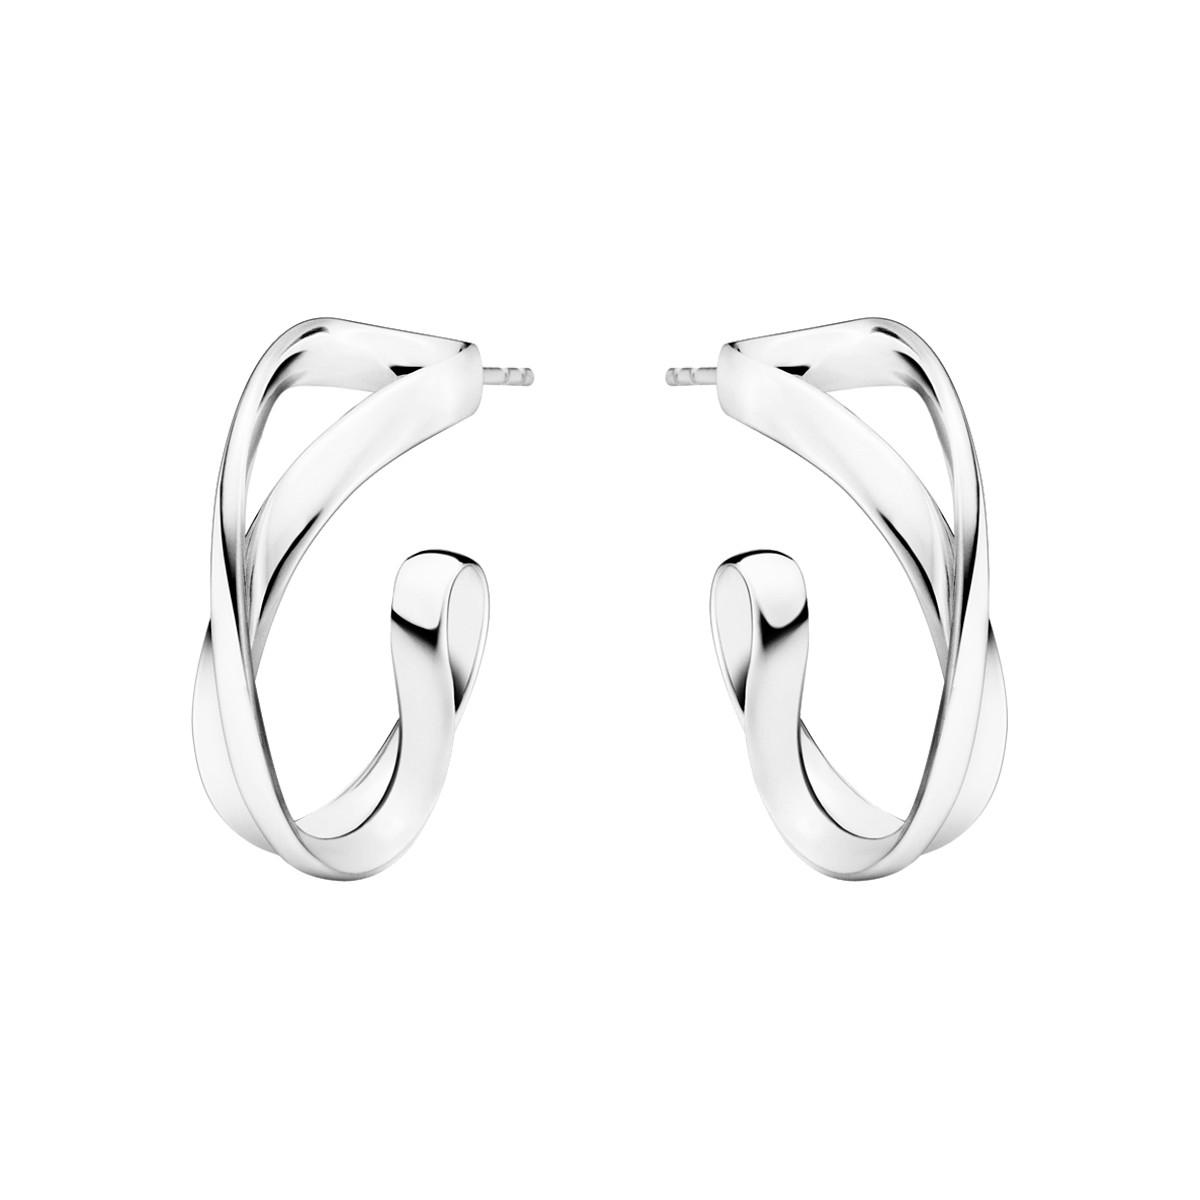 Infinity Ørestikker Sølv